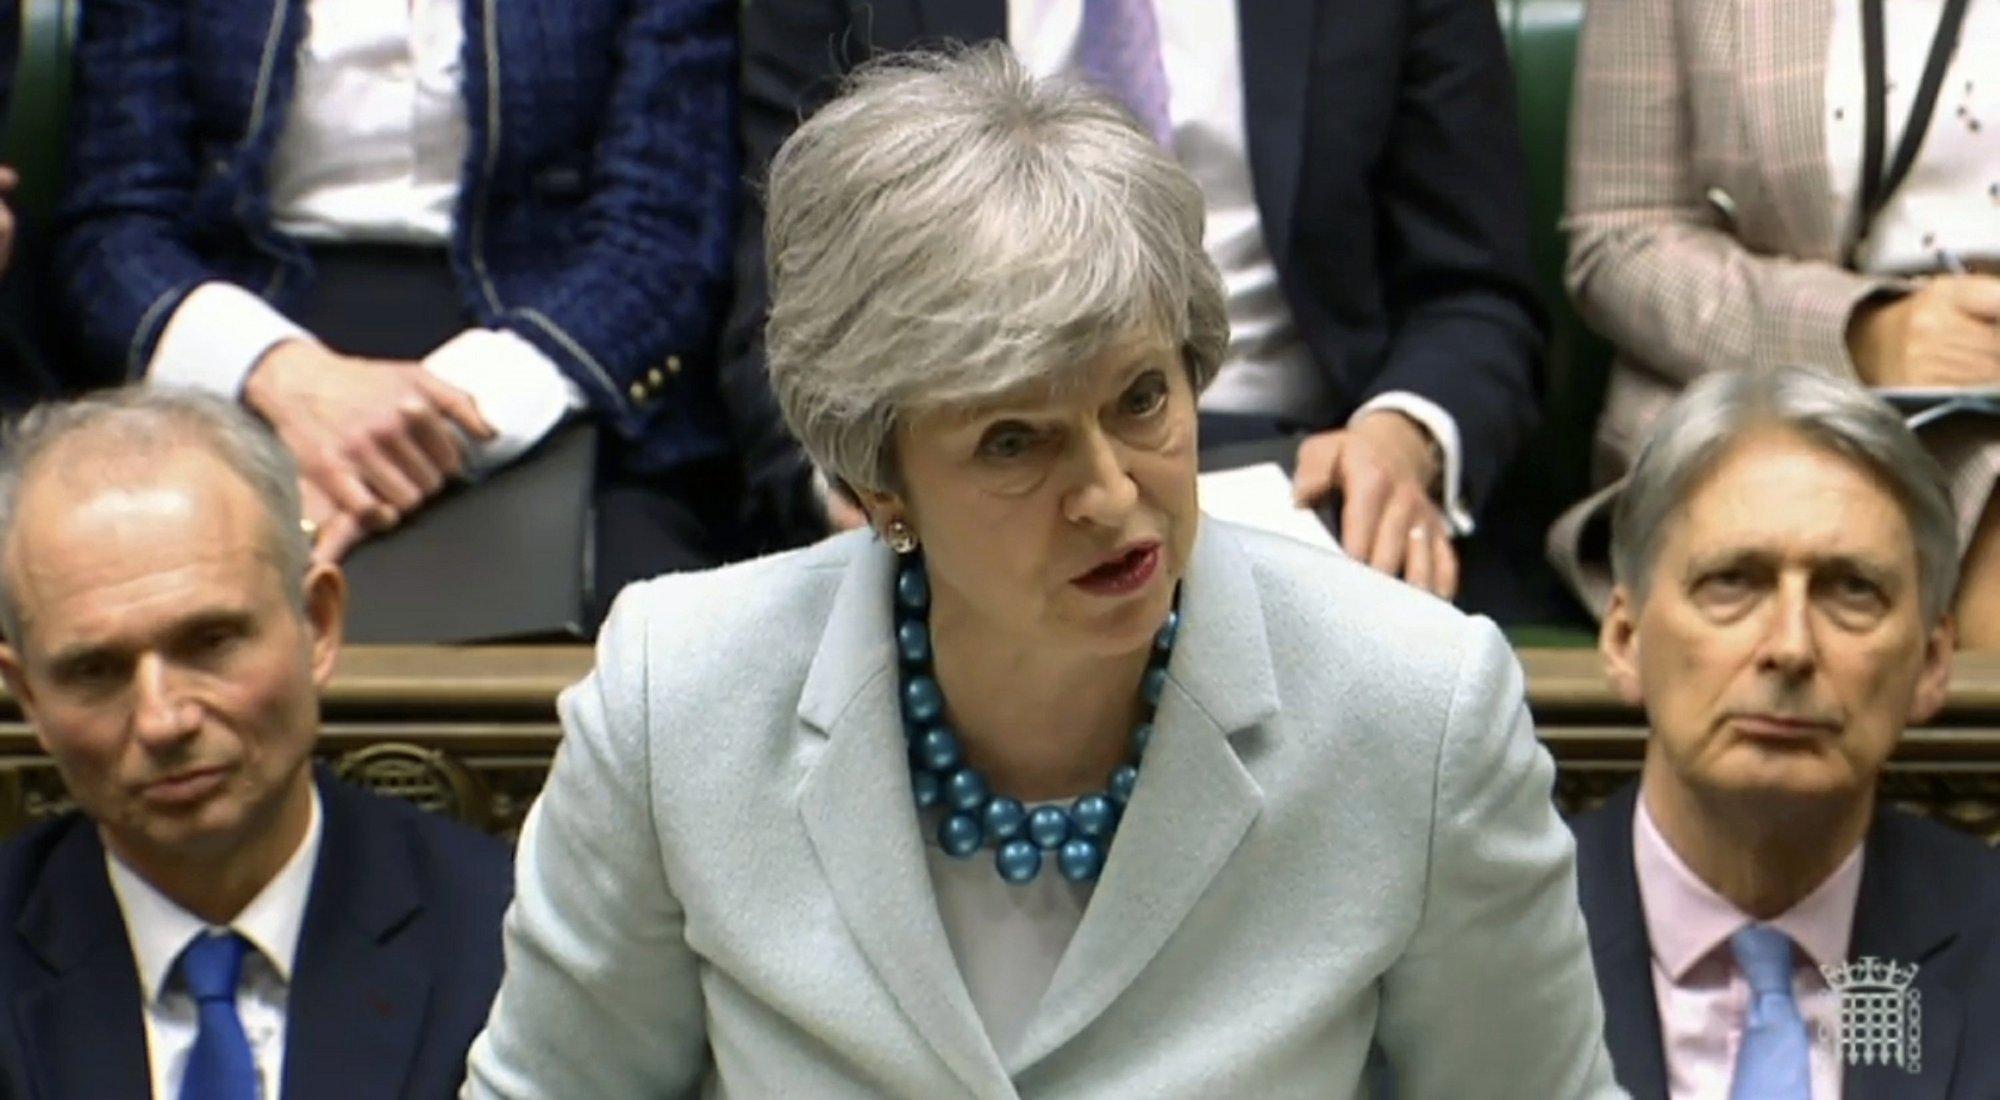 UK leader: Brexit deal still lacks support in Parliament